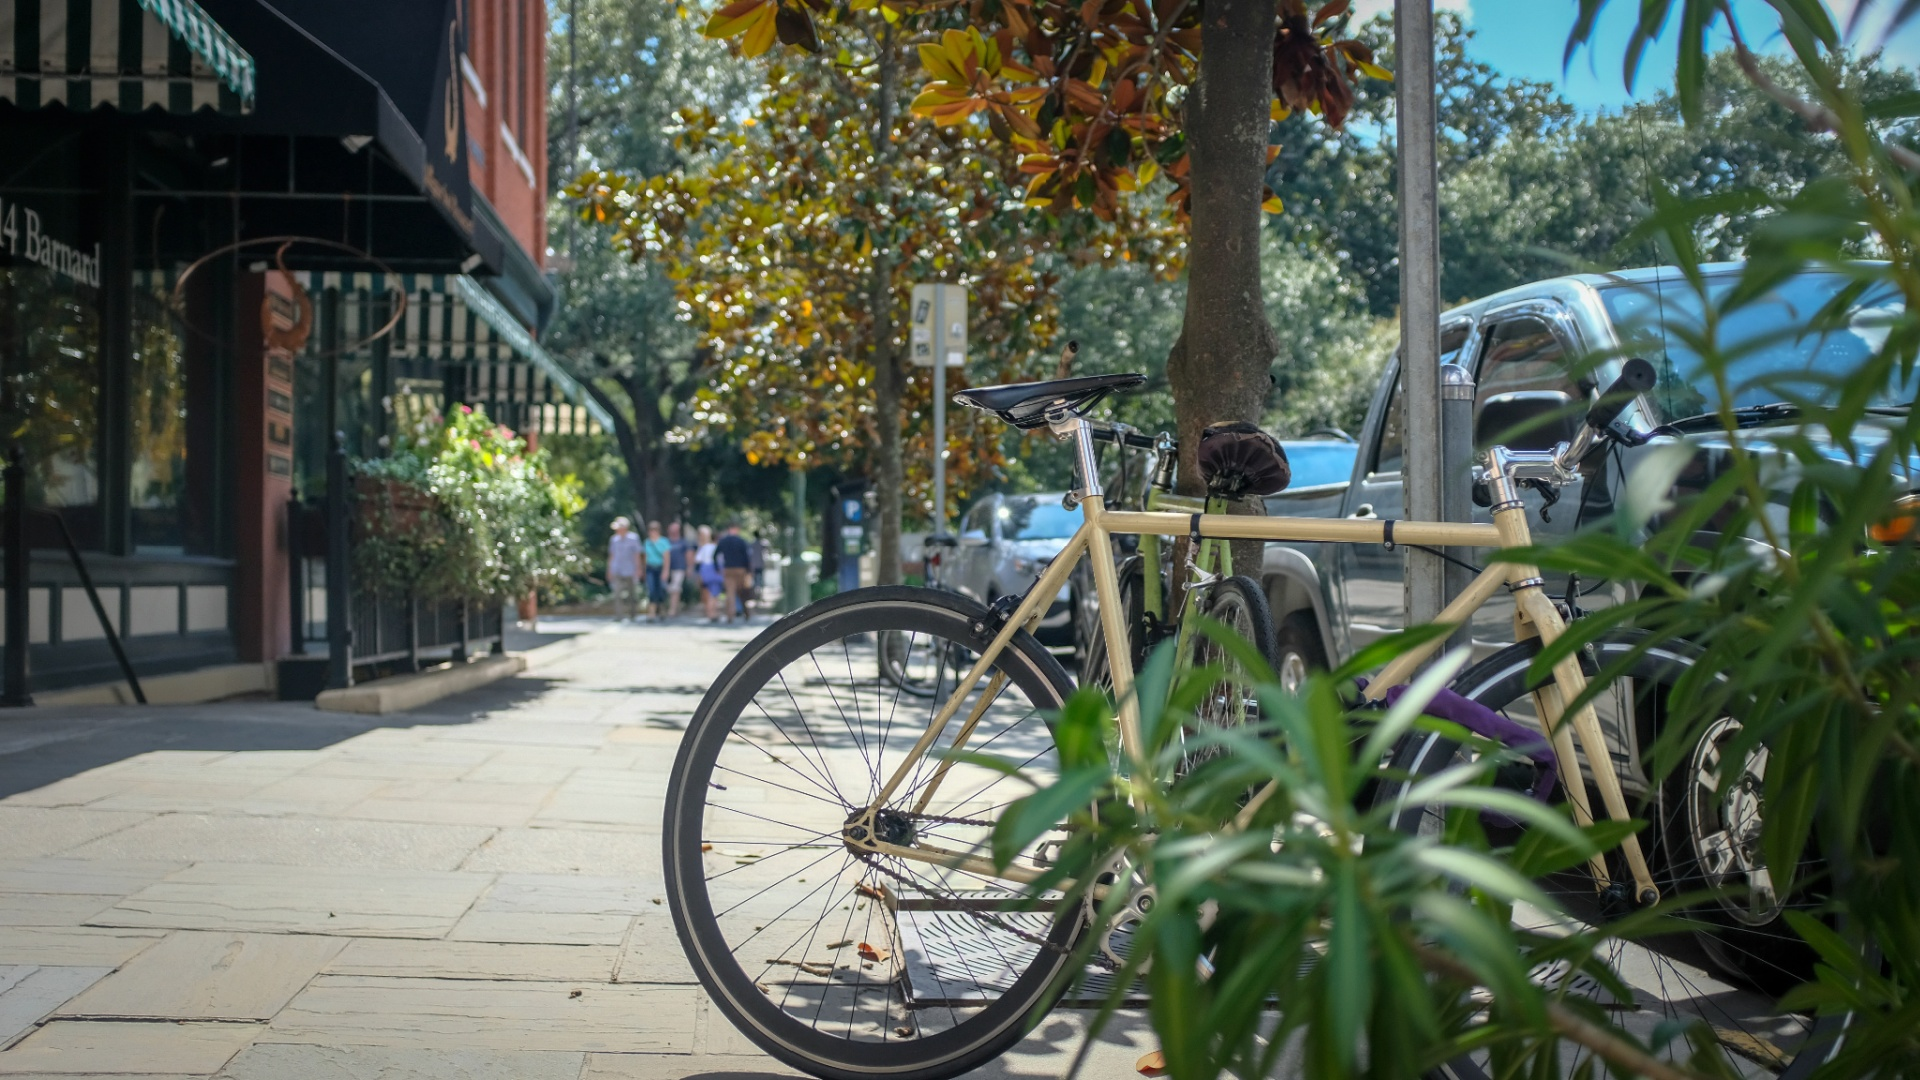 Planning The Perfect Weekend In Savannah